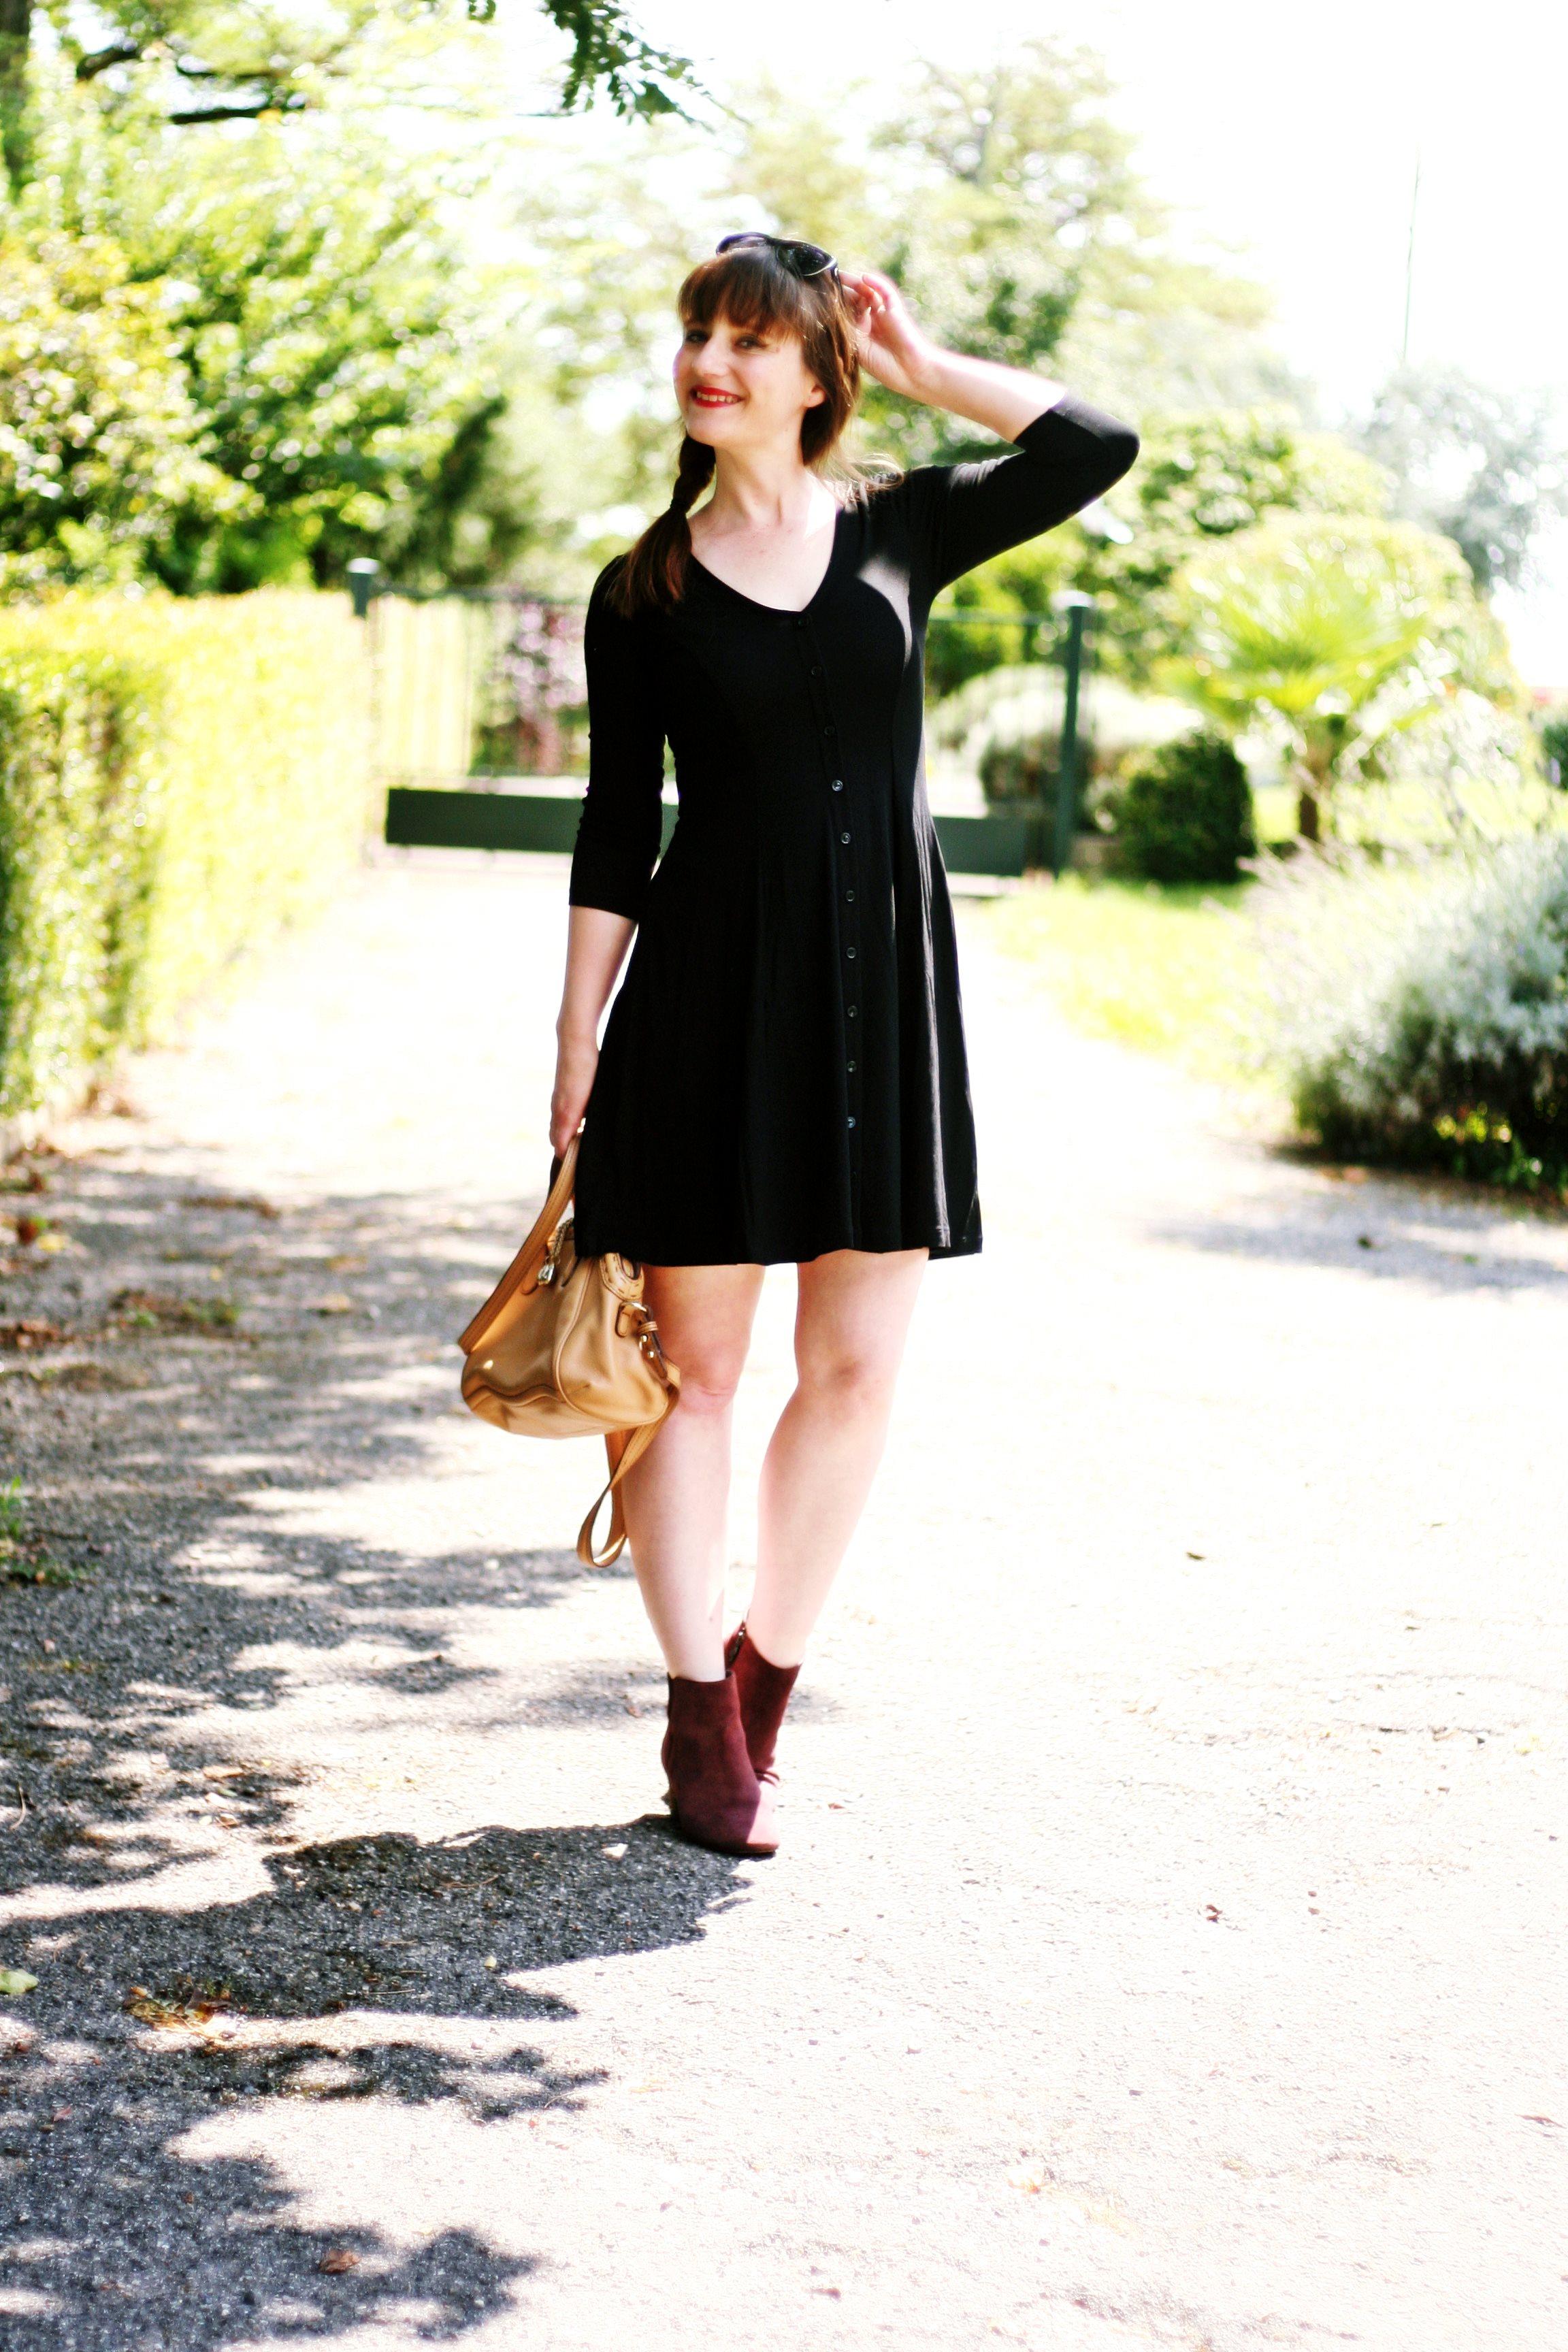 petite robe noire style 90 robe boutonnées blog mode